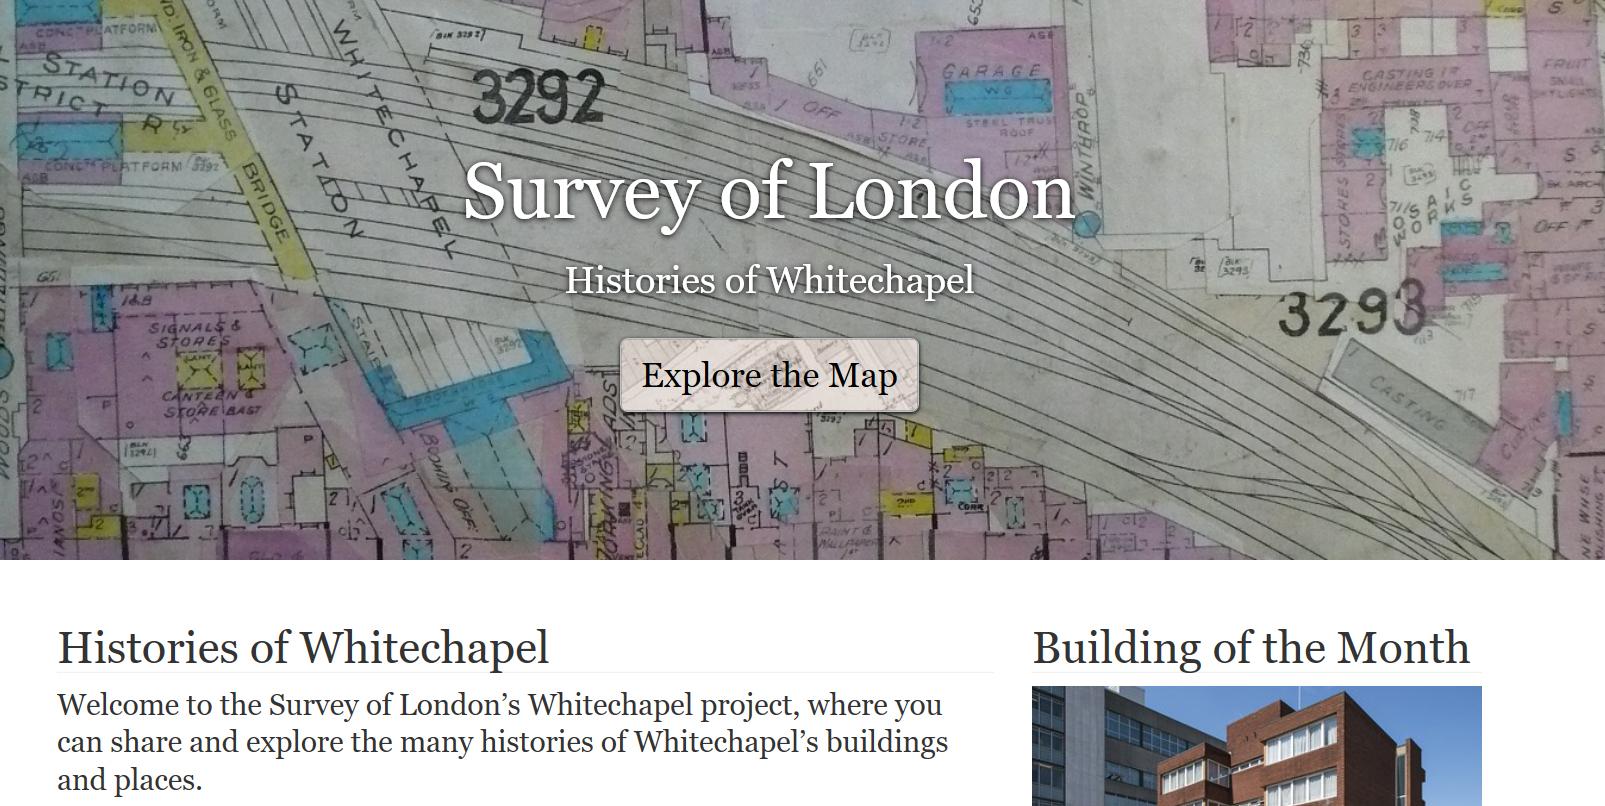 Whitechapel Gallery, 2017